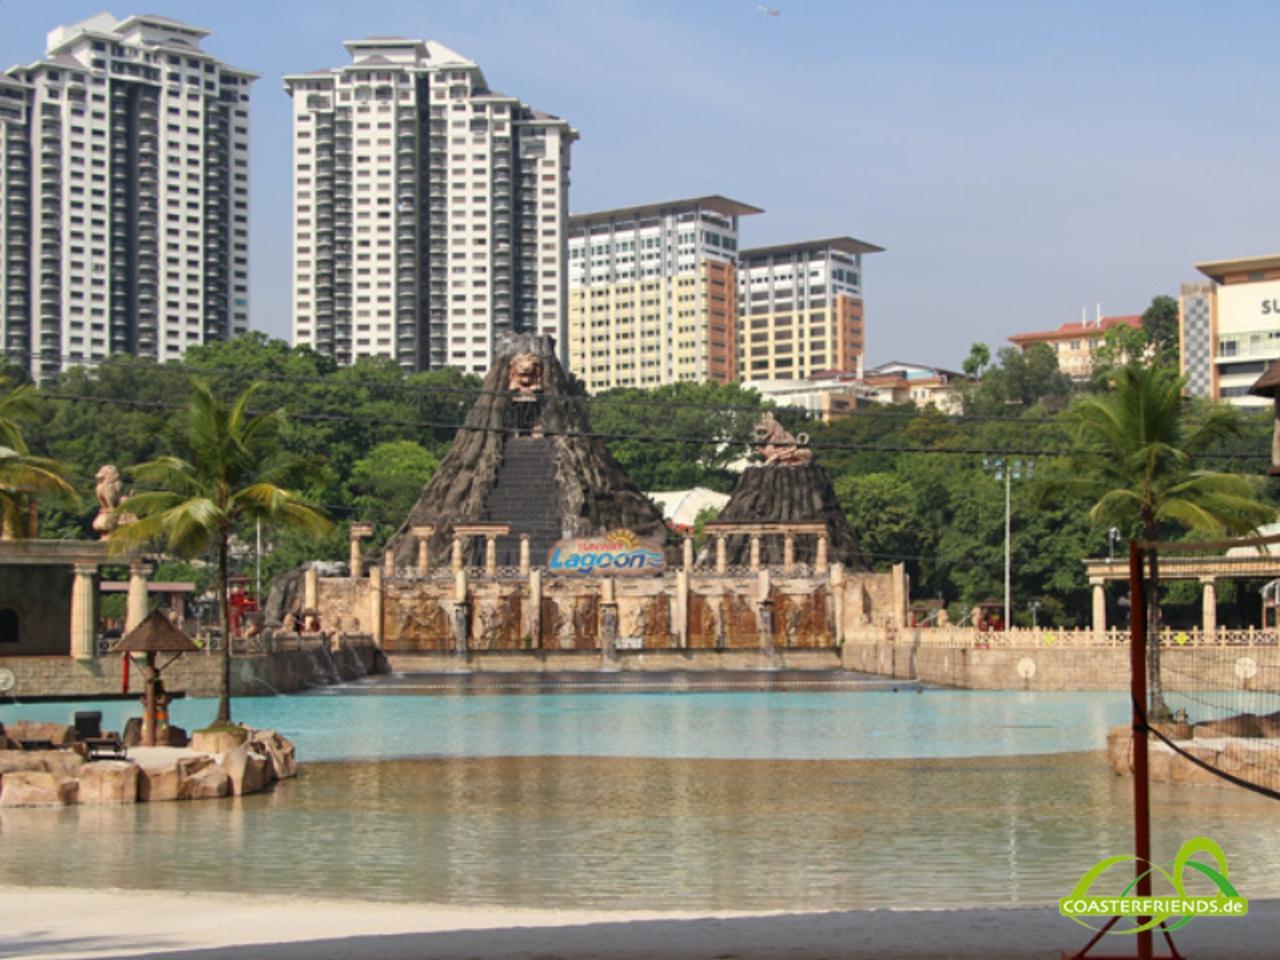 Asien - https://coasterfriends.de/joomla//images/pcp_parkdetails/asien/o2742_sunway_lagoon/content3.jpg